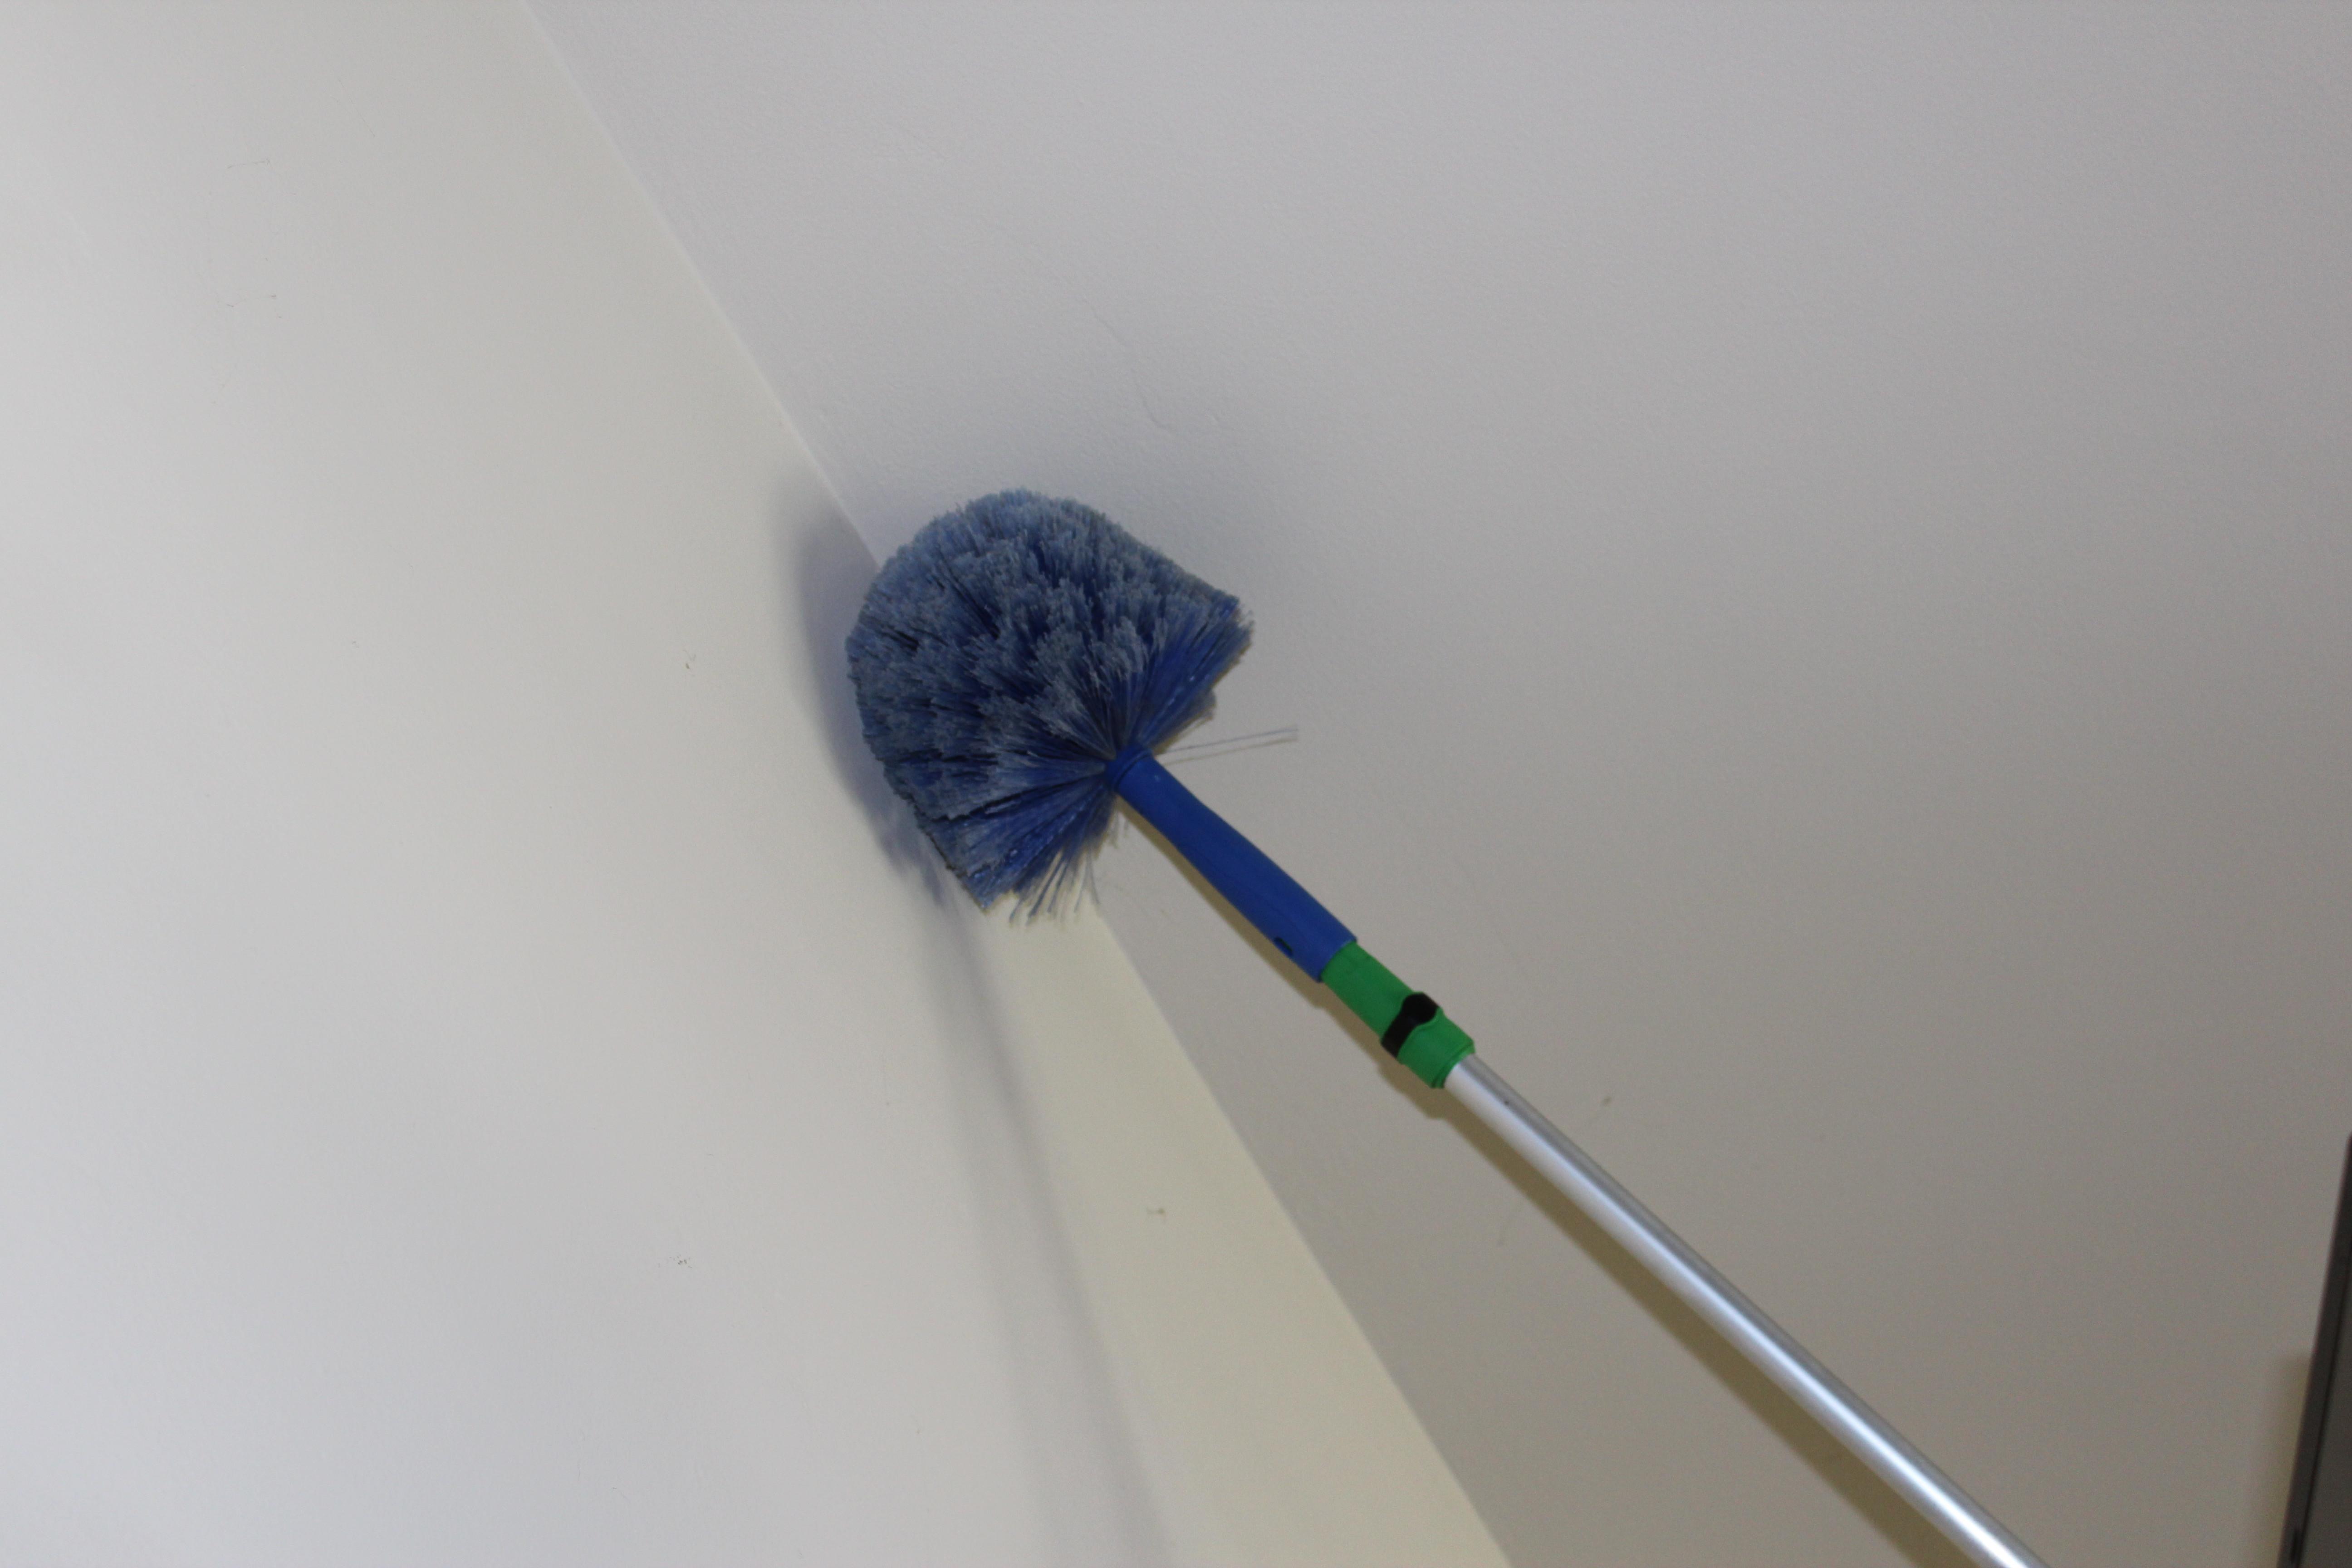 Cobweb Removal